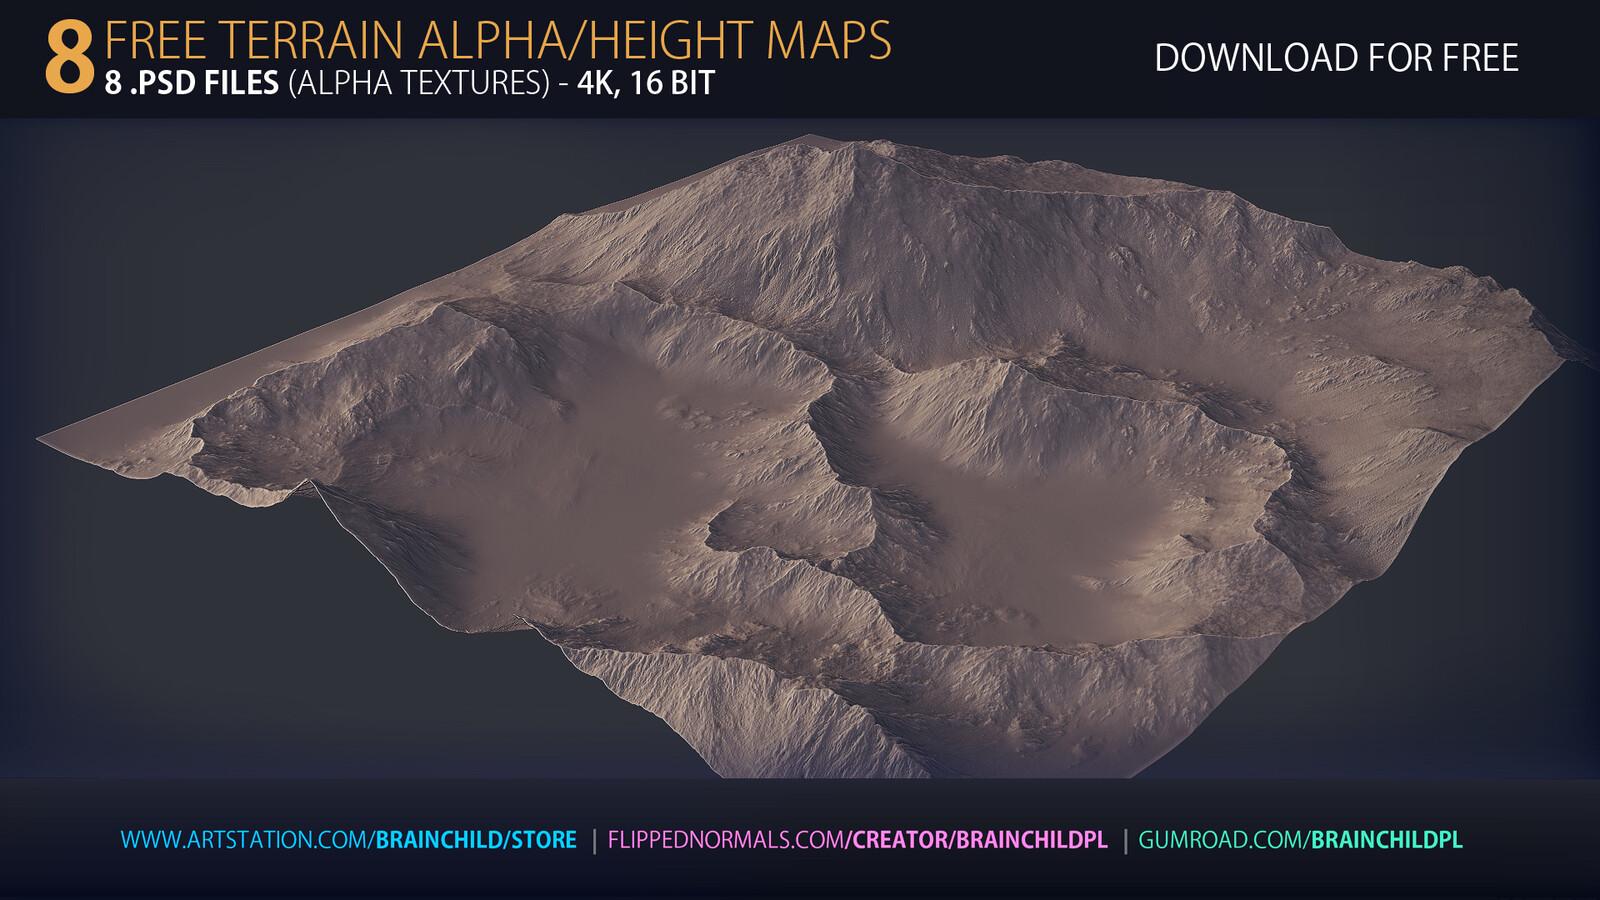 Download For Free https://www.artstation.com/brainchild/store | FREE - 8 Terrain Alpha Textures | Terrain Height Maps | 4k, 16bit